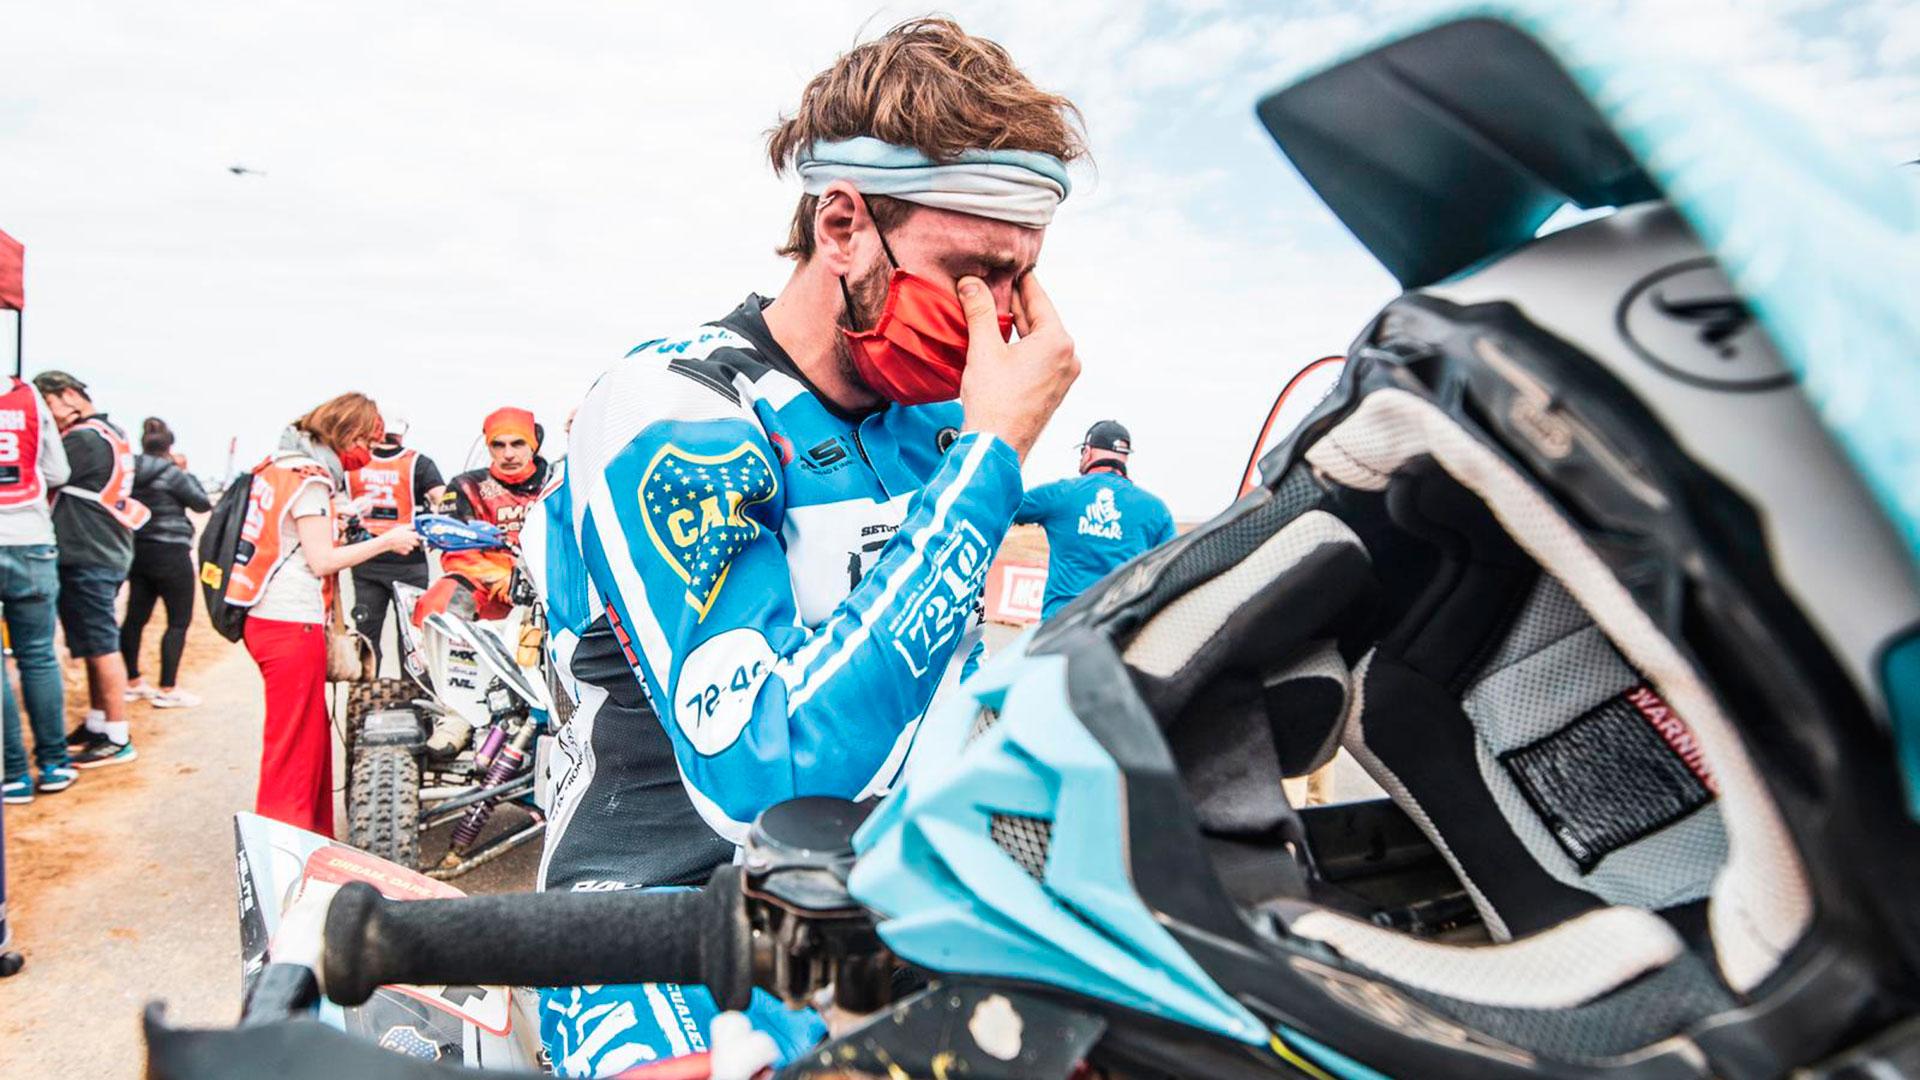 Manuel Andújar, oriundo de Lobos, se proclamó campeón del Dakar en quads